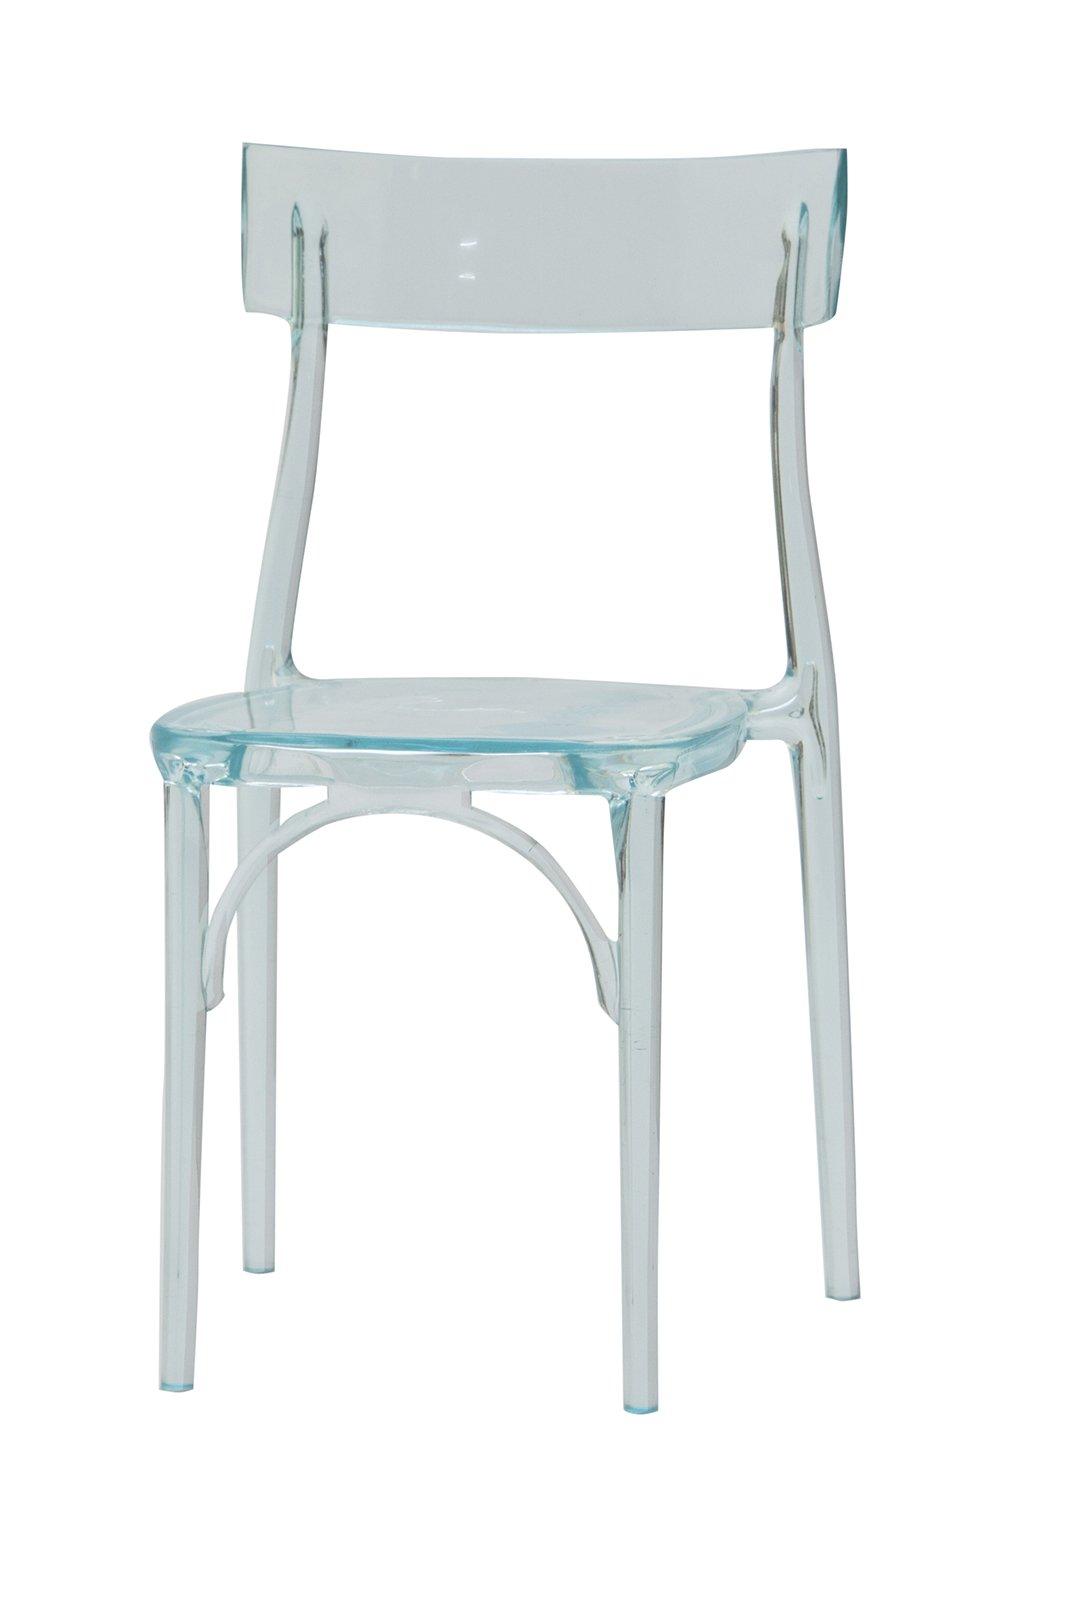 Sedie trasparenti prezzi sedie in plastica prezzi great sedie